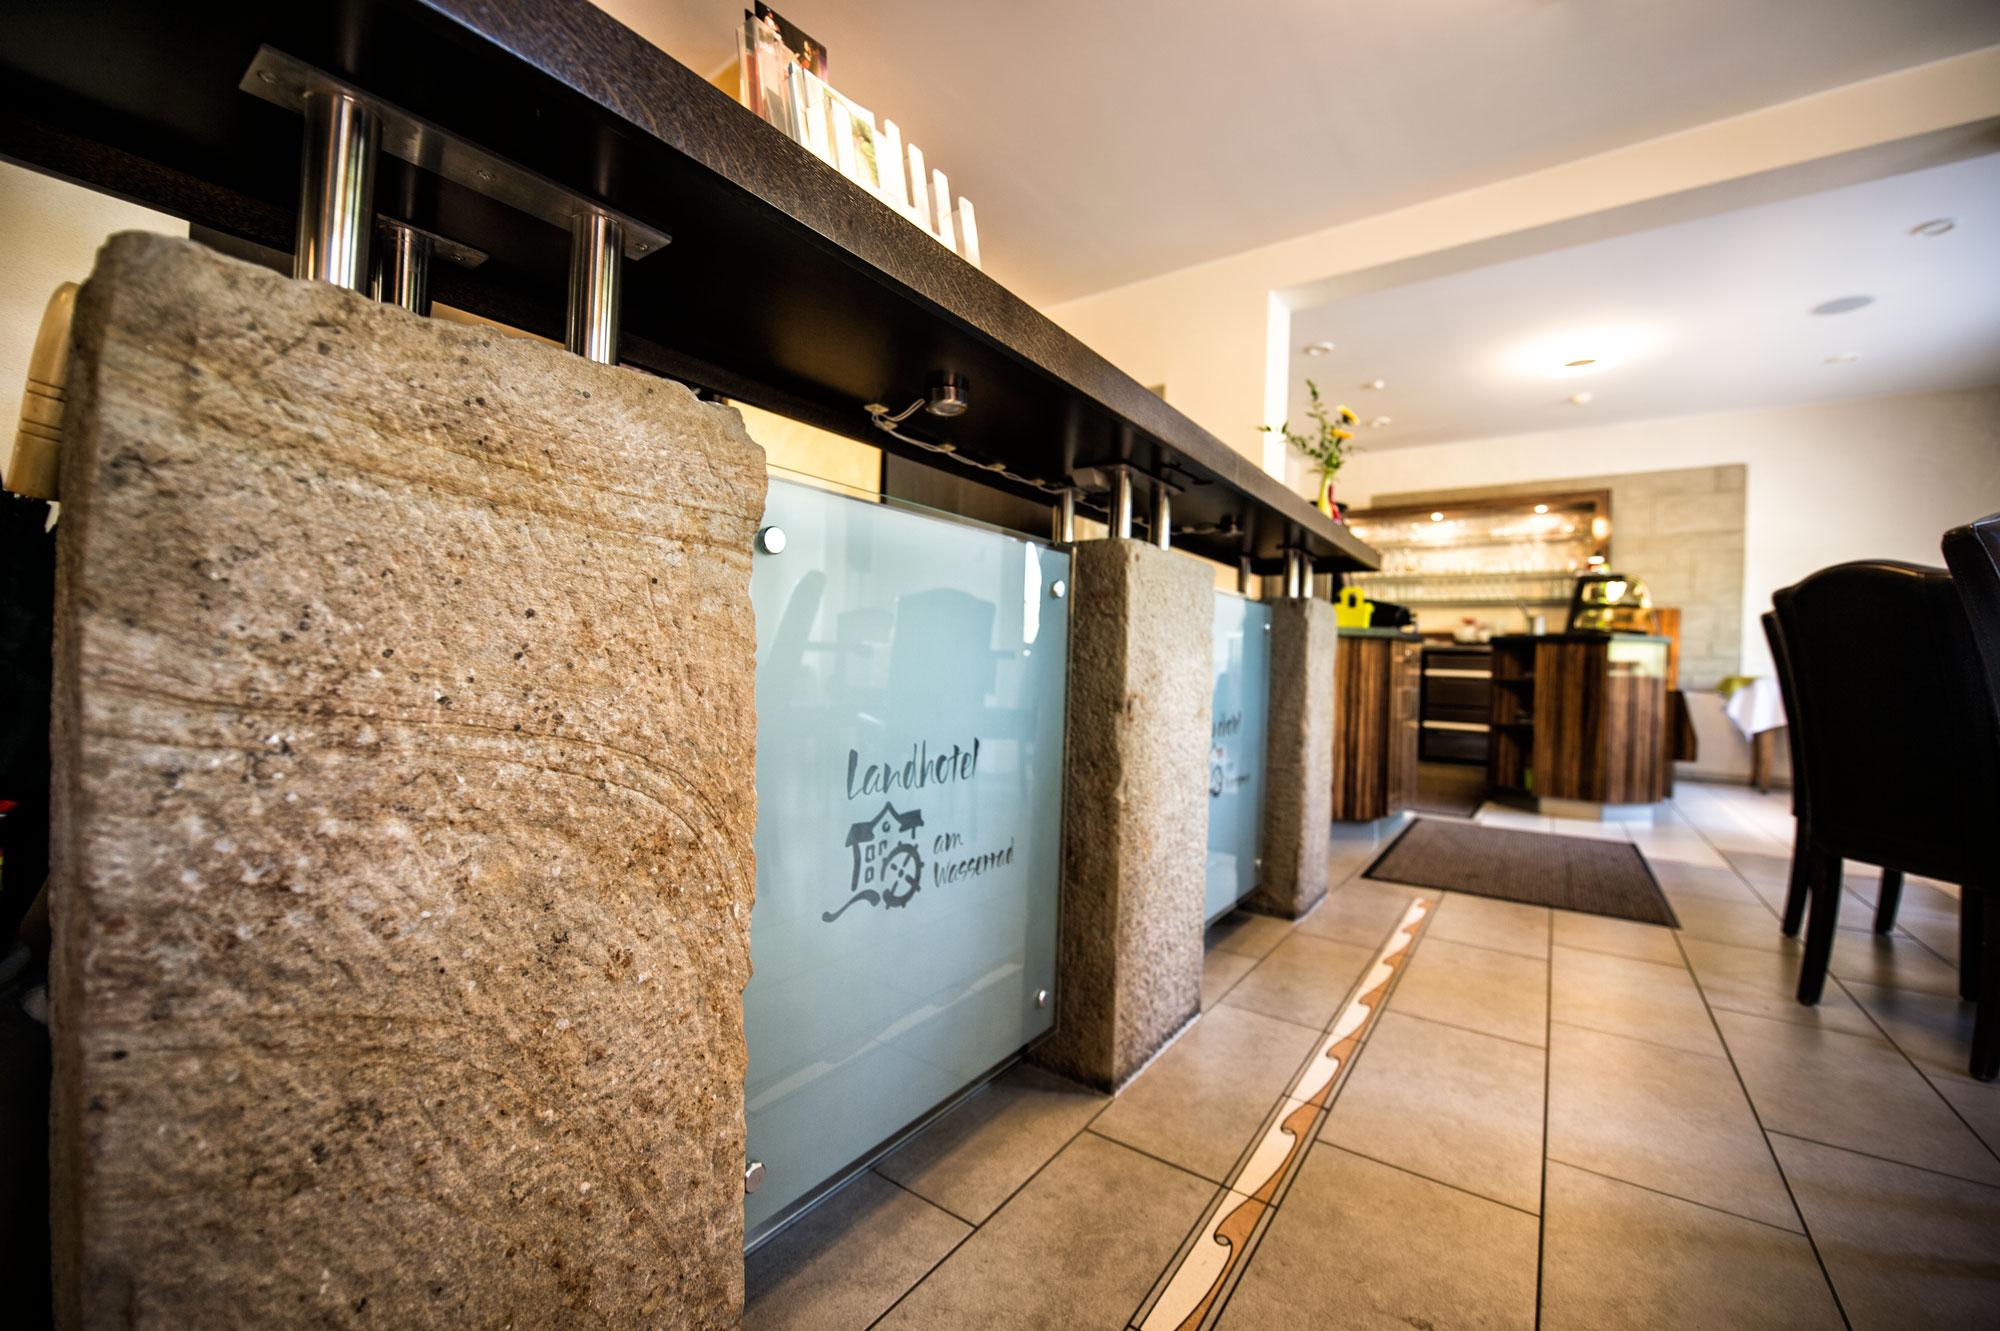 Hotel-Wasserrad-Cafe-2